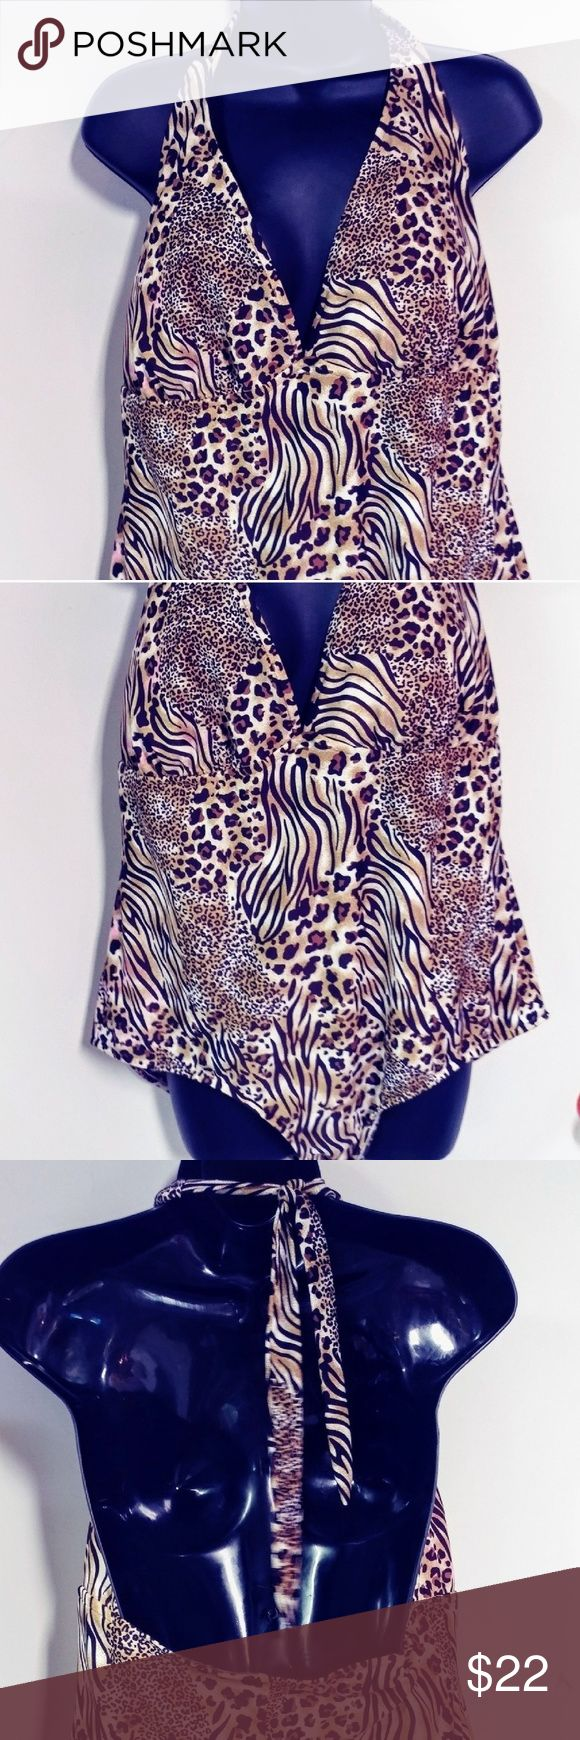 Plus Size Animal Print Swimsuit Excellent condition. No snags. Adjustable halter tie. catalina Swim One Pieces